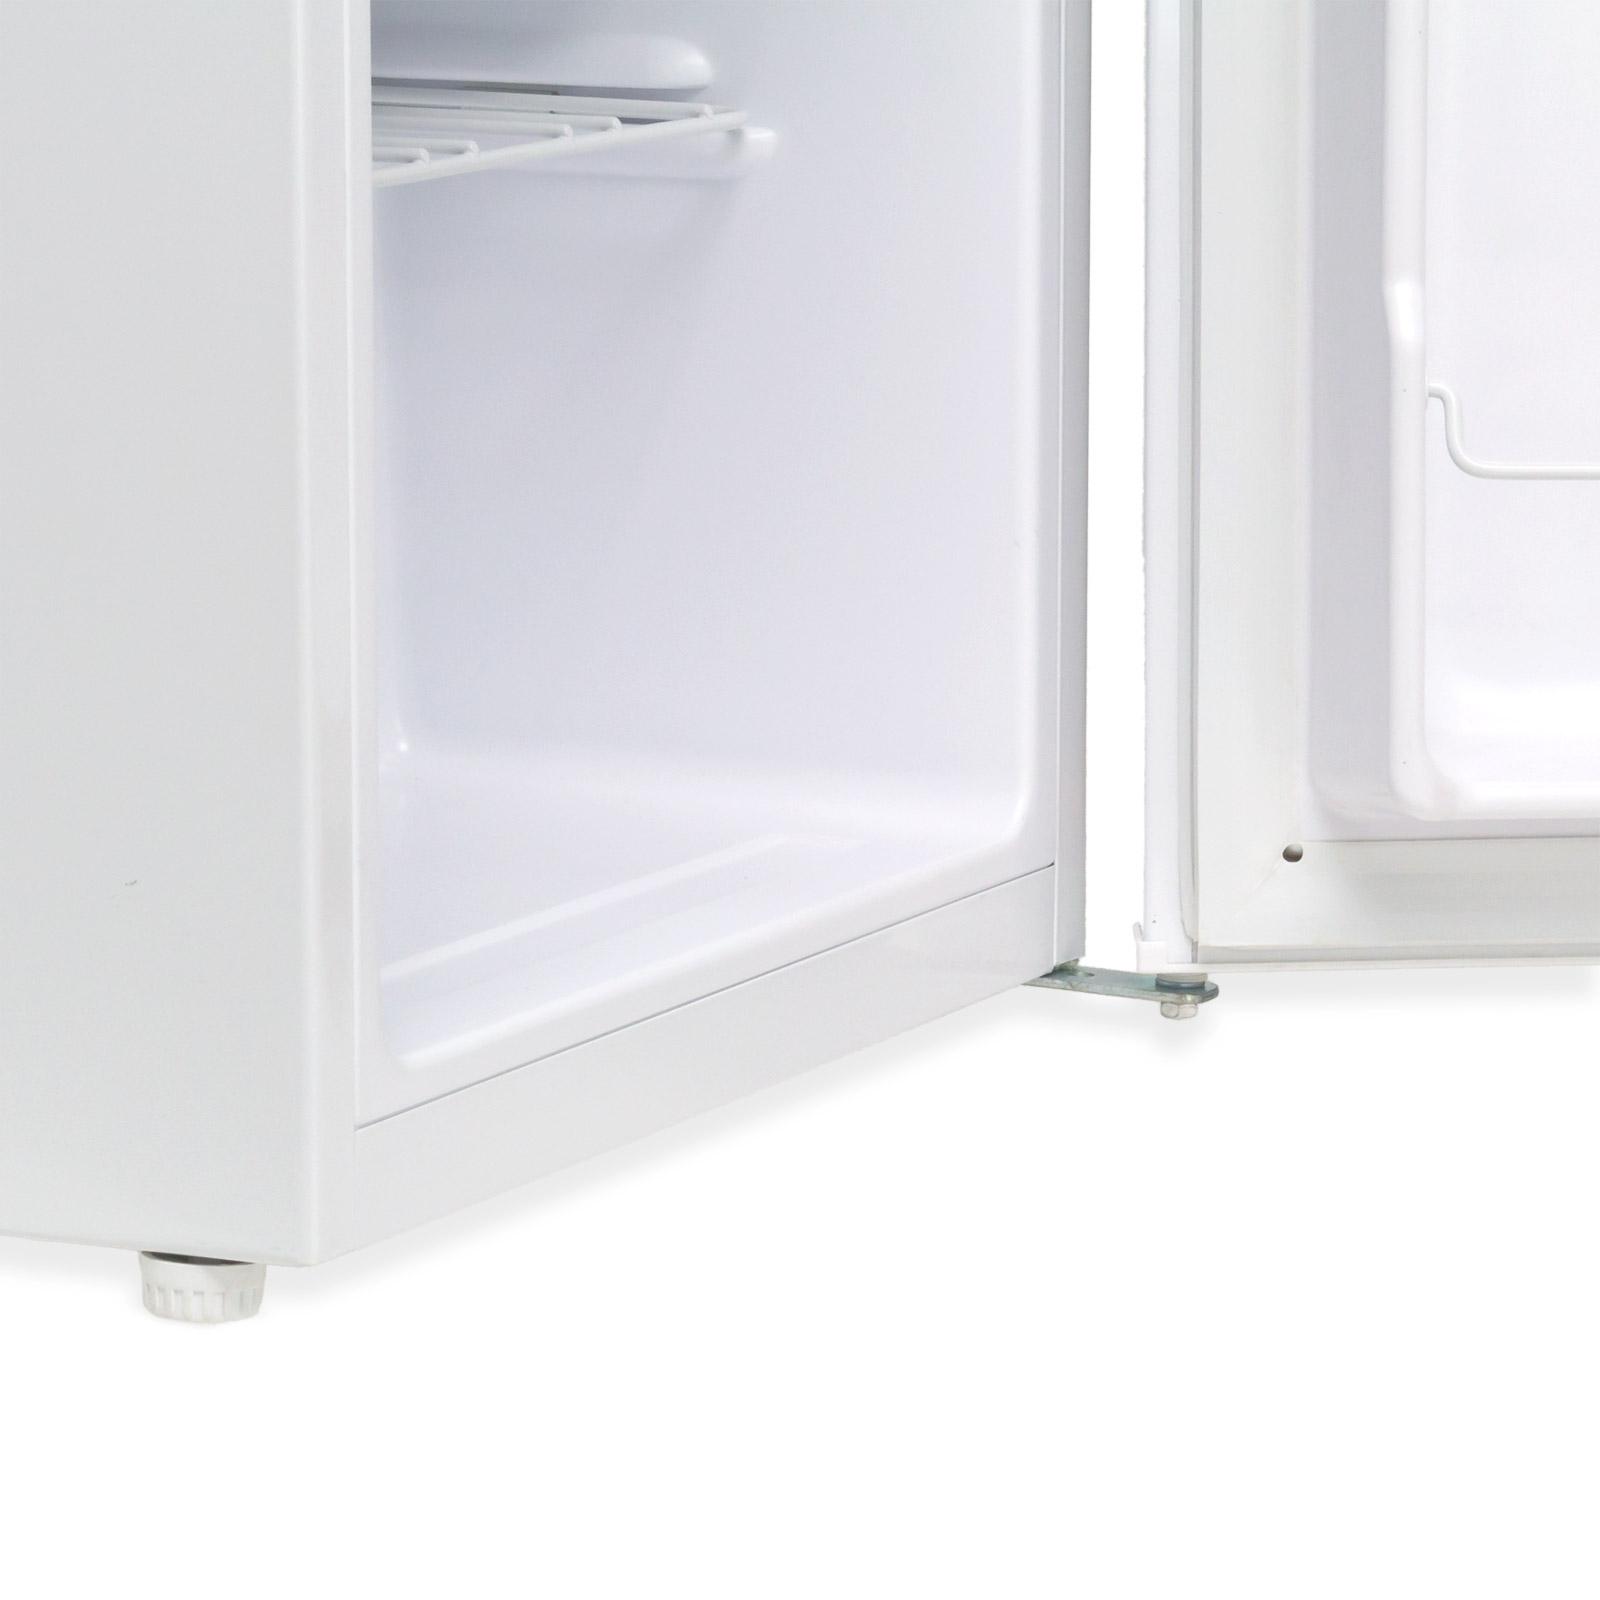 Kühlschrank Minikühlschrank Wohnmobil Camping Minibar 47 l A+ NEU ...